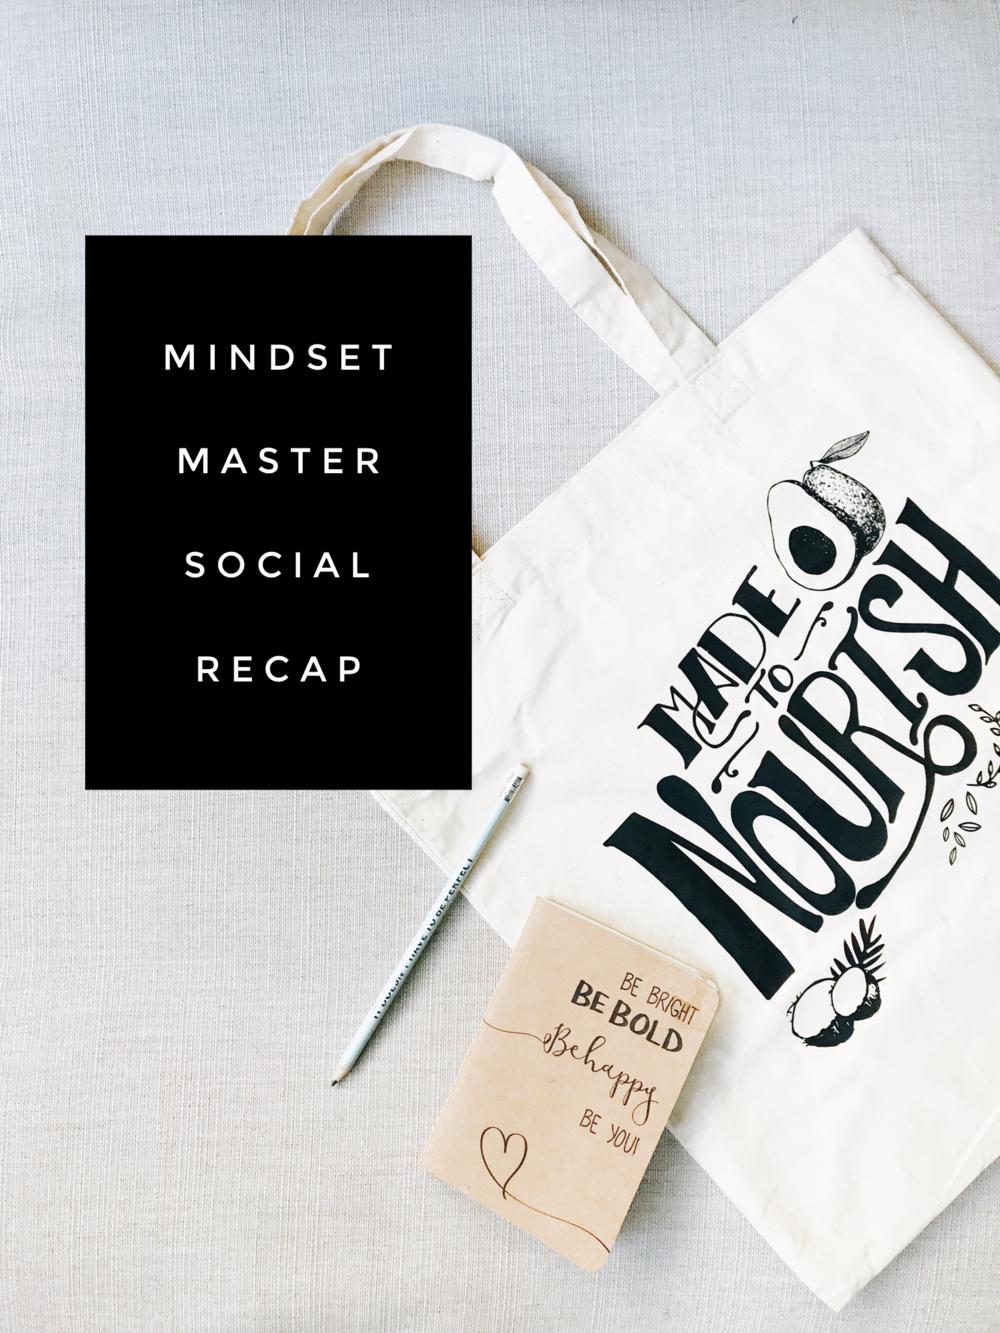 Mindset Master Social Event Recap on the Josie Feather Blog